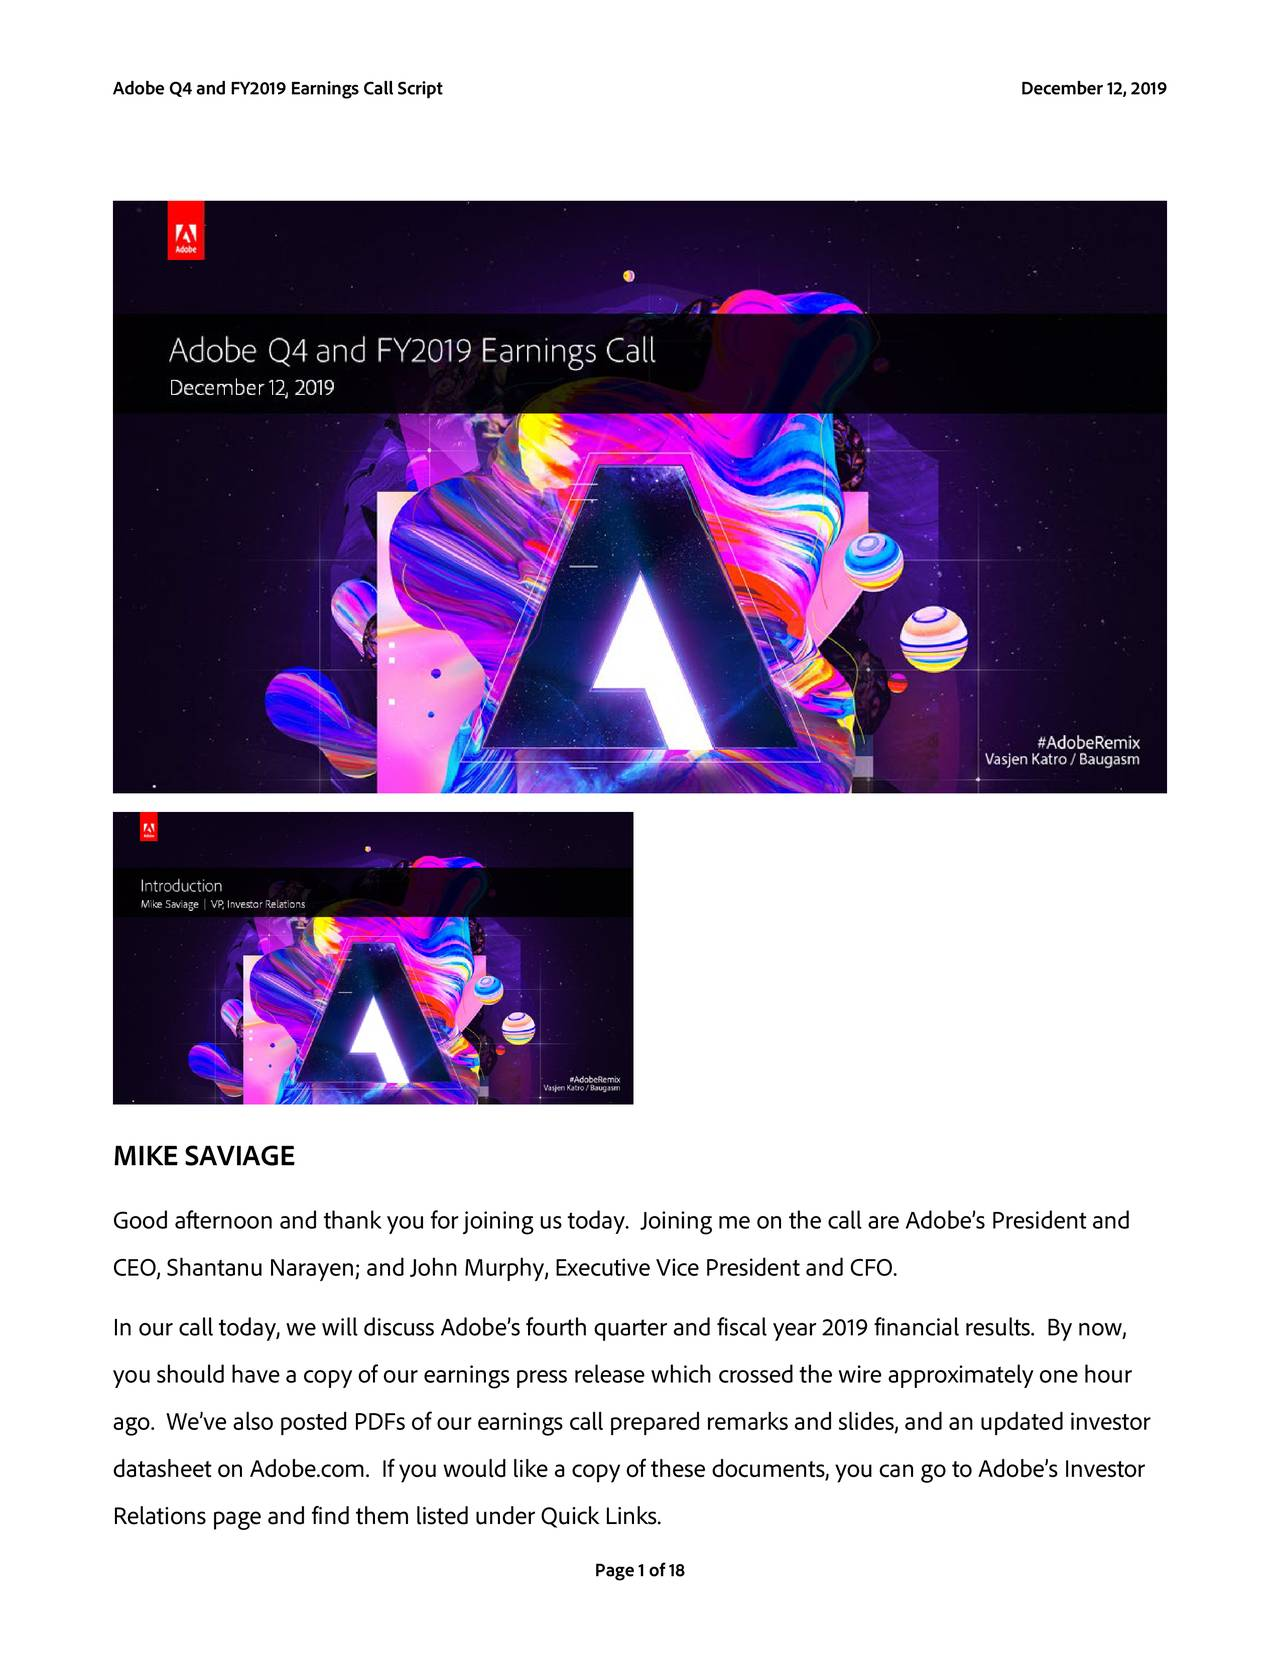 Adobe Inc. 2019 Q4 - Results - Earnings Call Presentation - Adobe Inc. (NASDAQ:ADBE) | Seeking Alpha